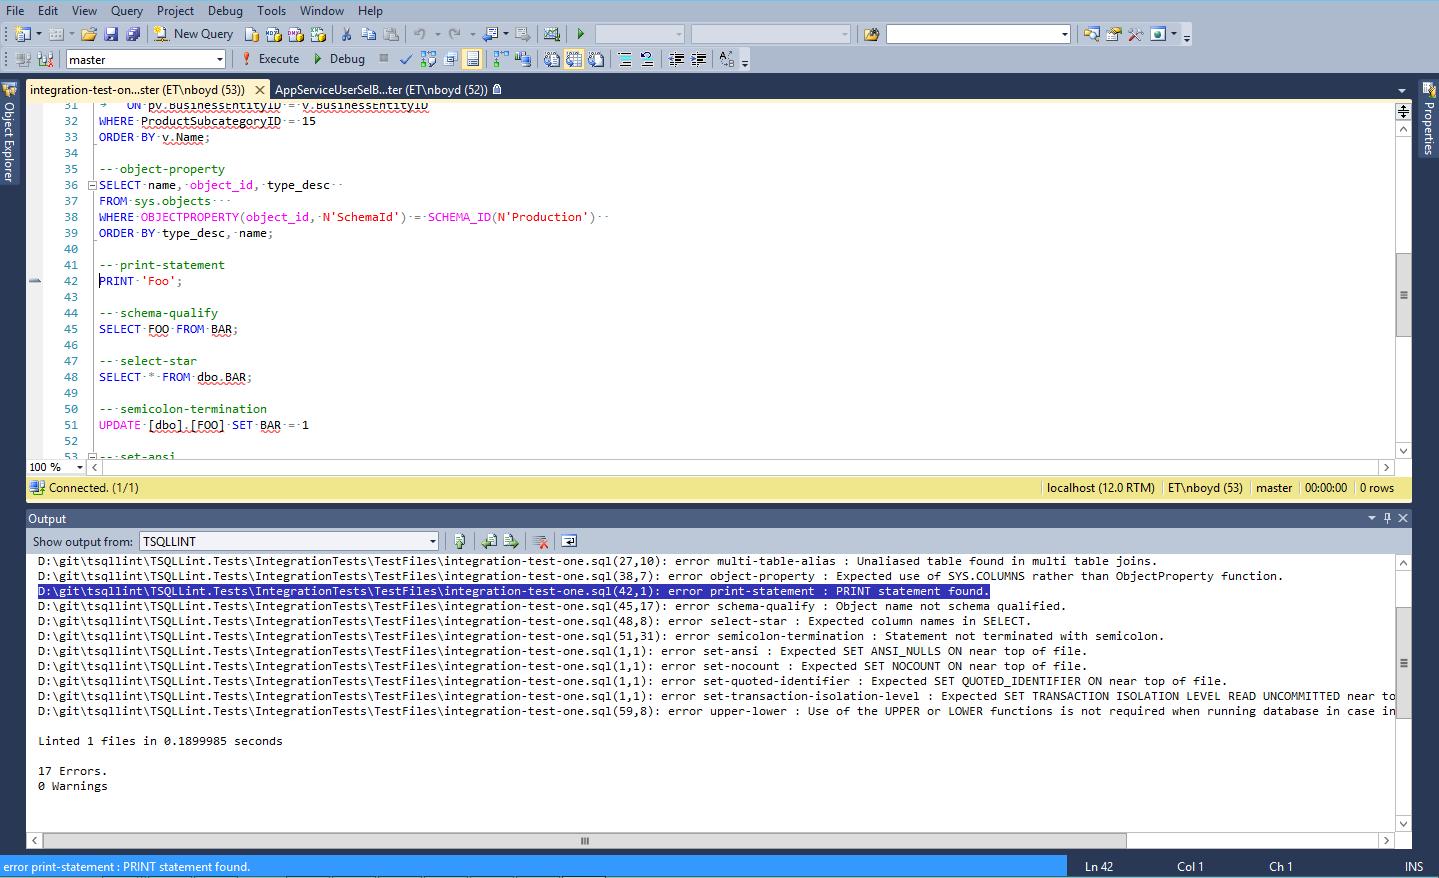 SSMS Integration Image